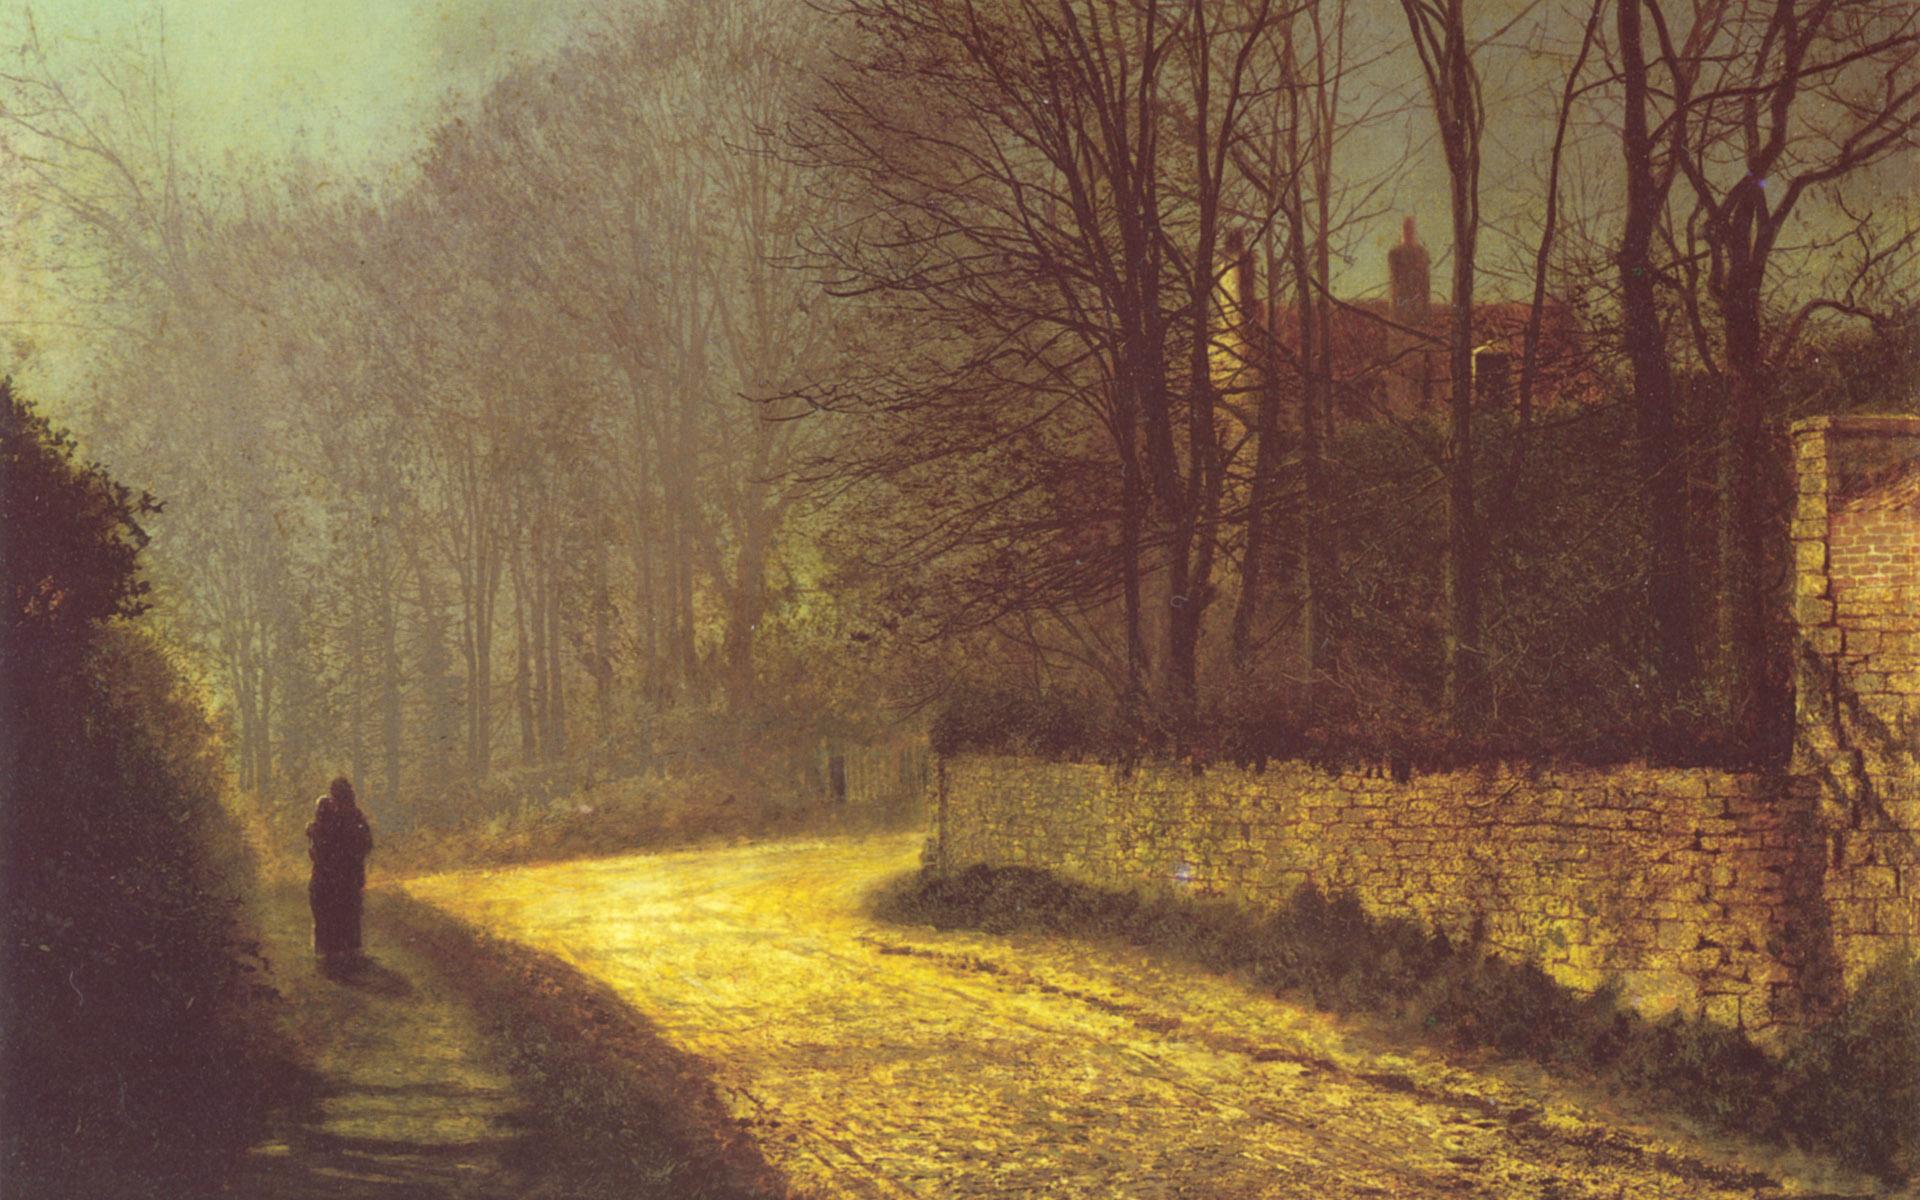 Fine Art Painting Art Prints Buy a Poster 1920x1200